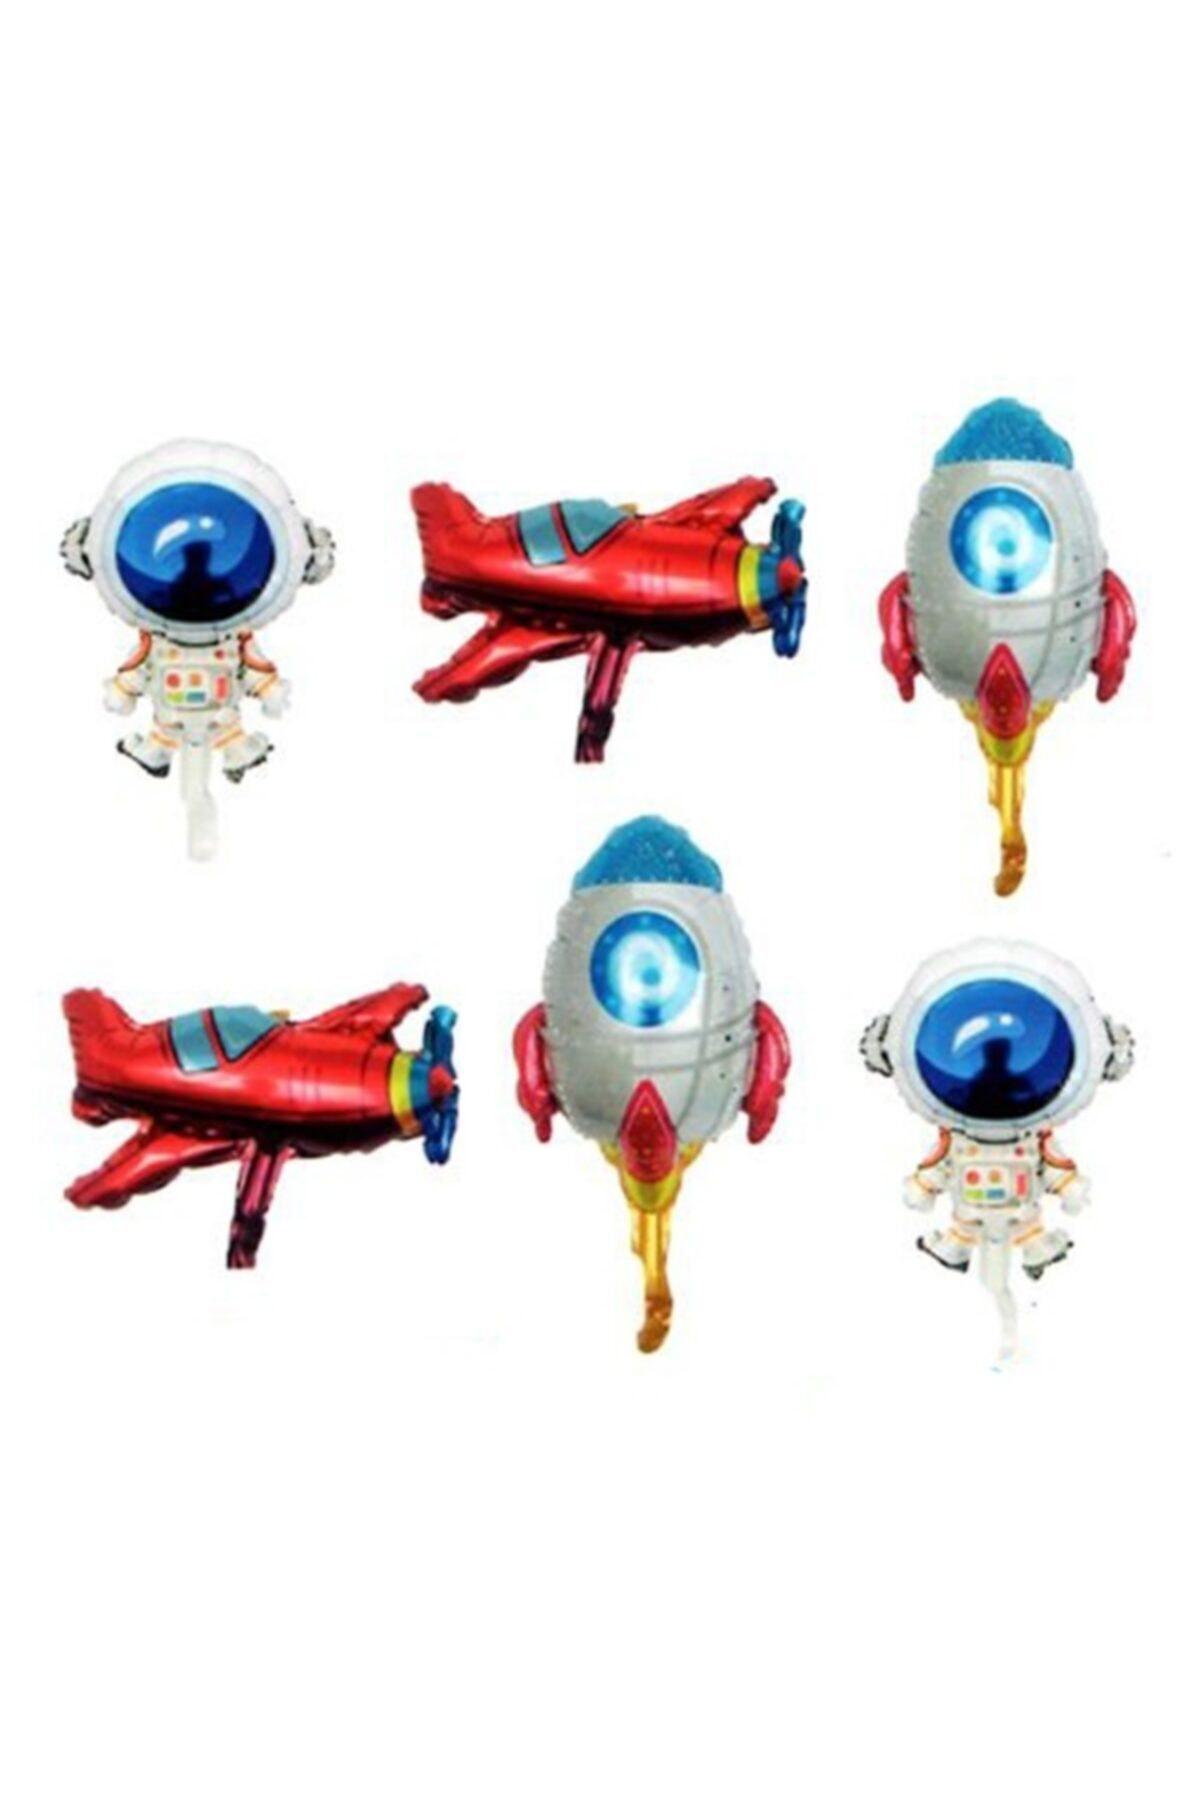 Uzay Konsepti 6 Lı Folyo Balon Seti - 14 Inch